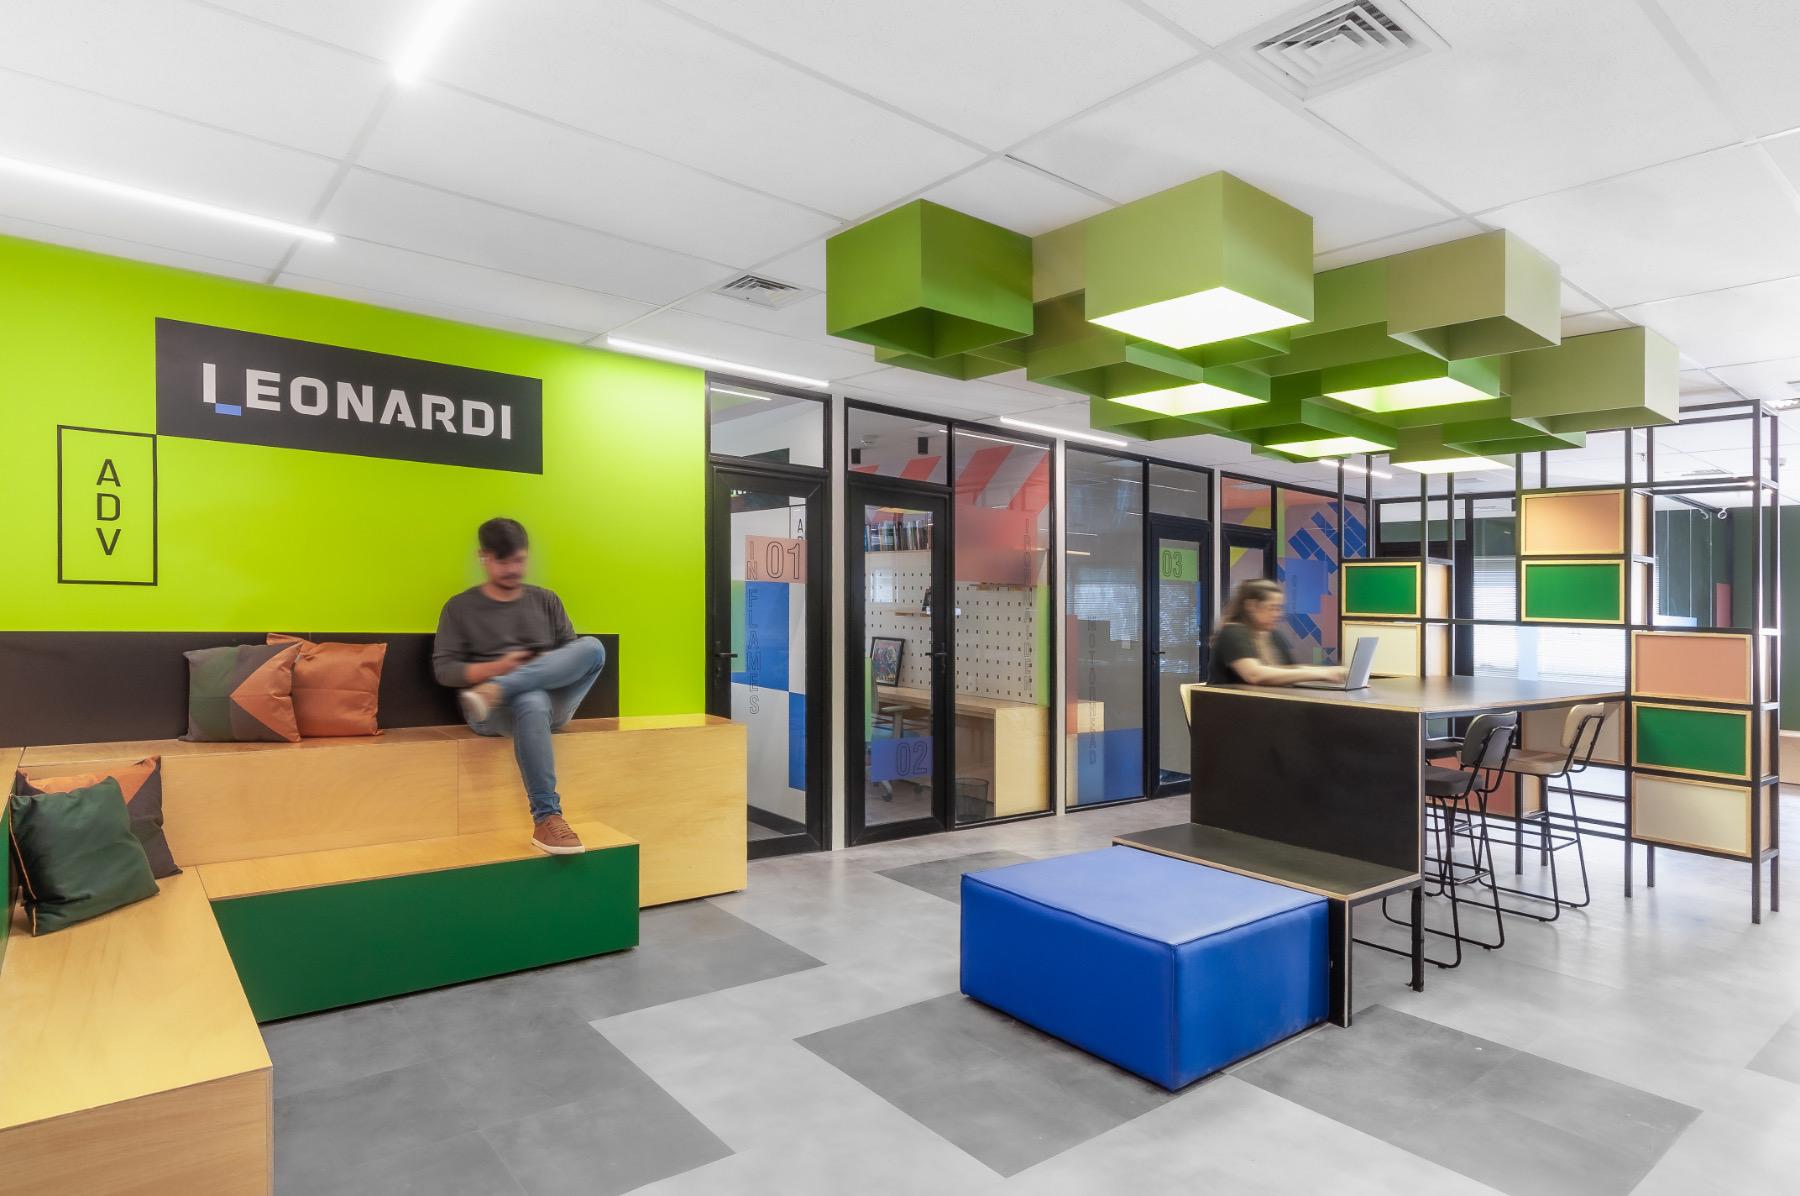 leonardi-advogados-sao-paulo-office-15